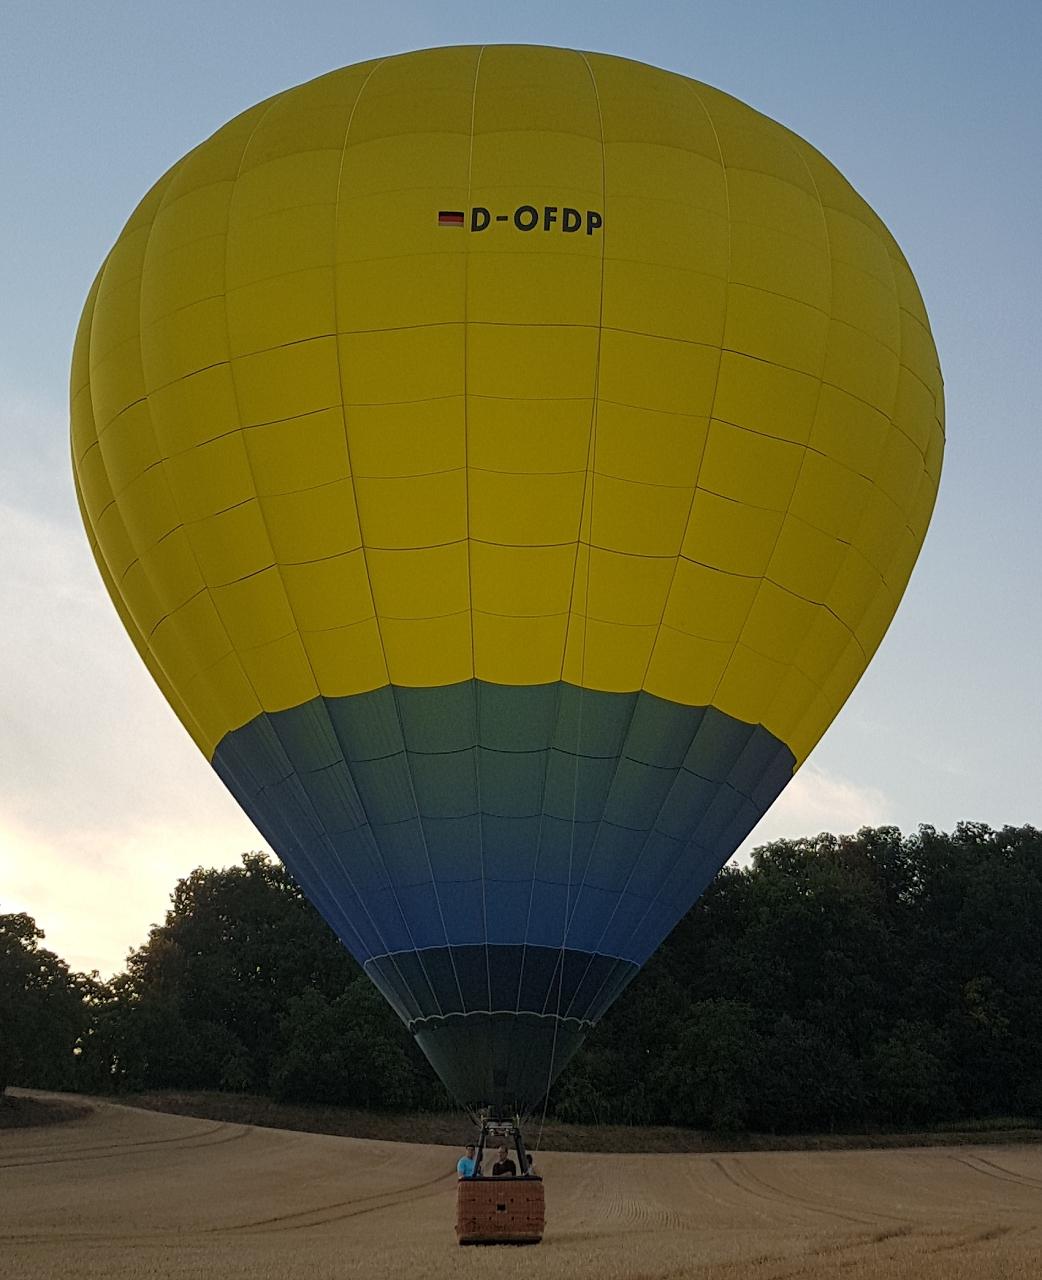 Mein_Ballon_D-OFDP_04